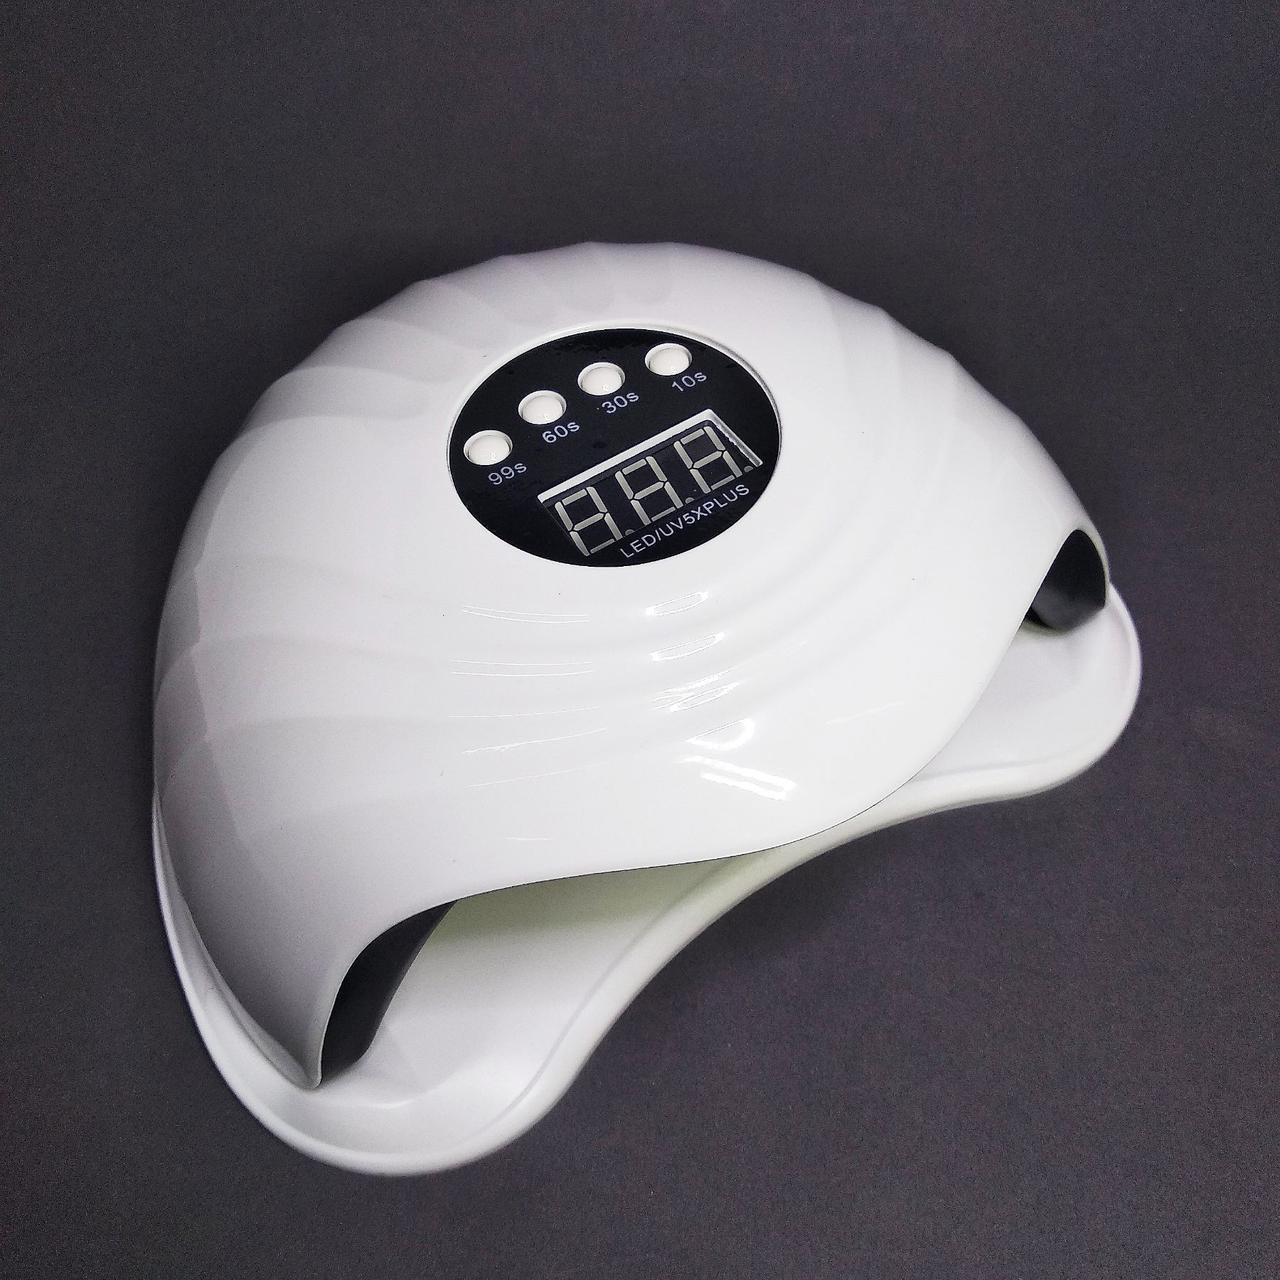 LED/UV лампа для ногтей Sun 5X Plus 108вт